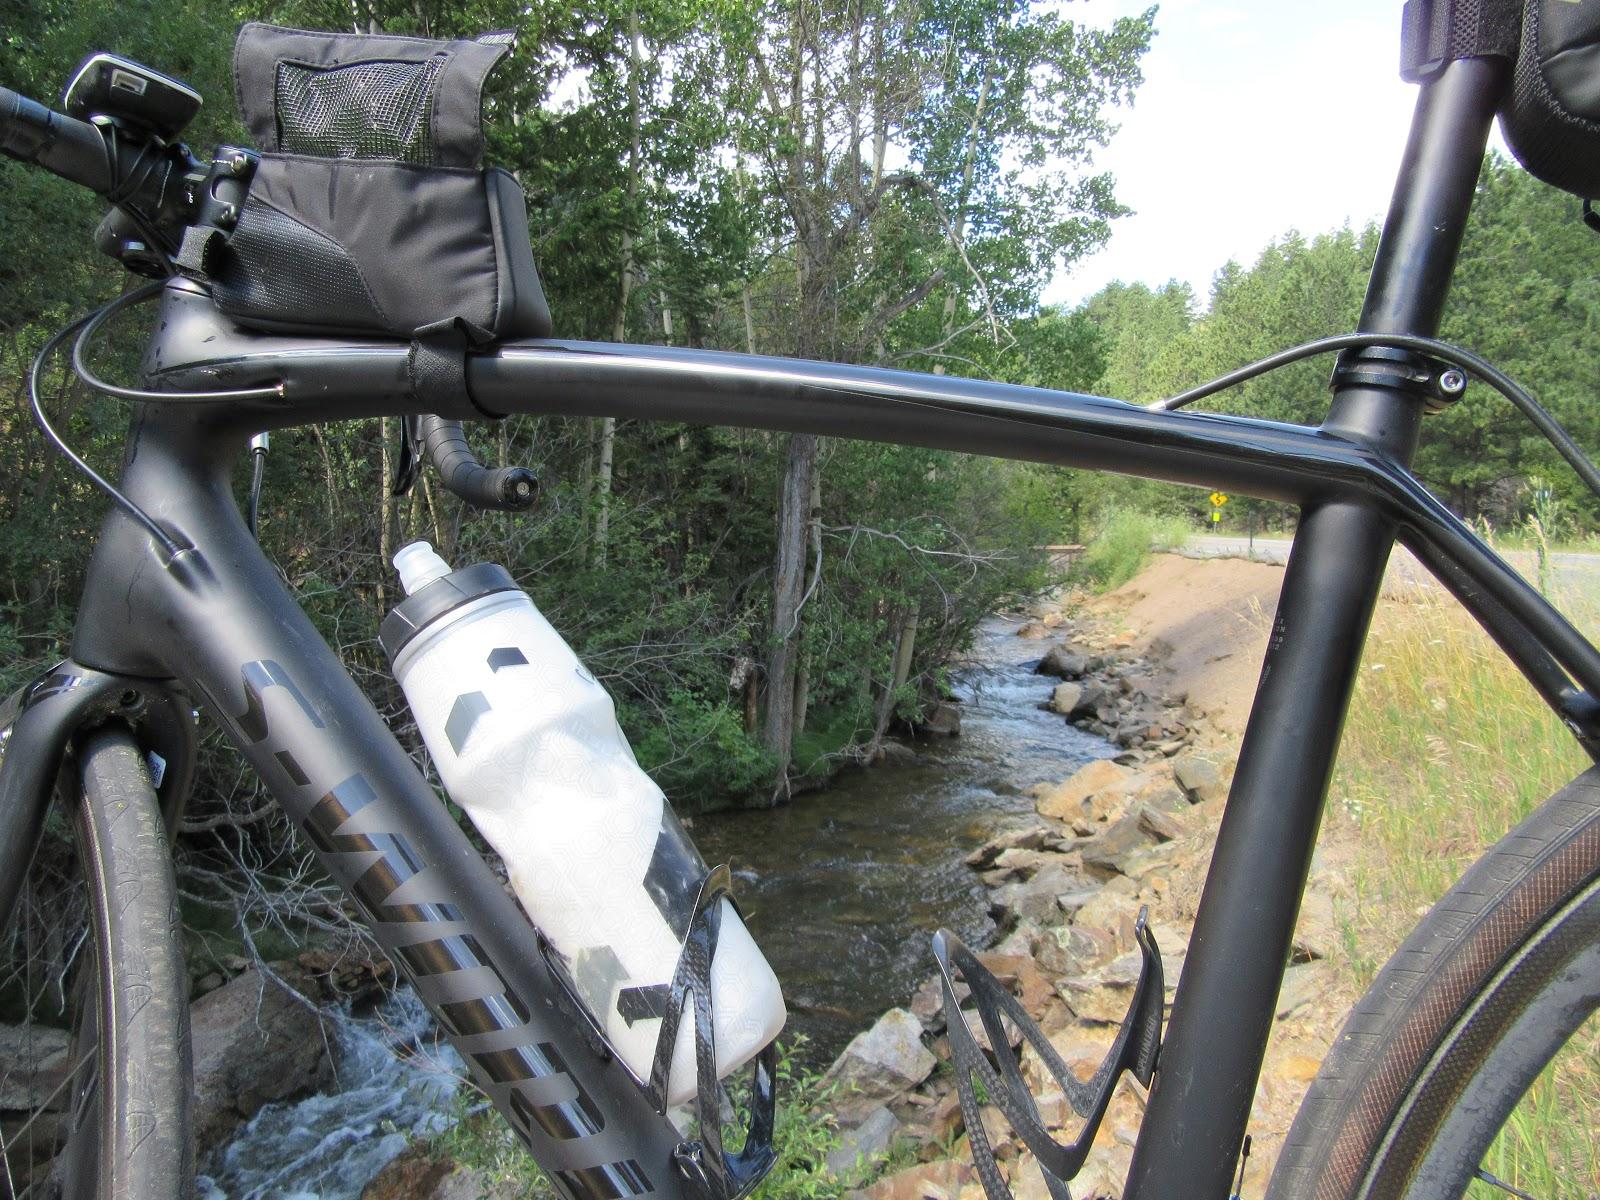 Bicycle ride up Left Hand Canyon - Left Hand Creek and bicycle on bridge